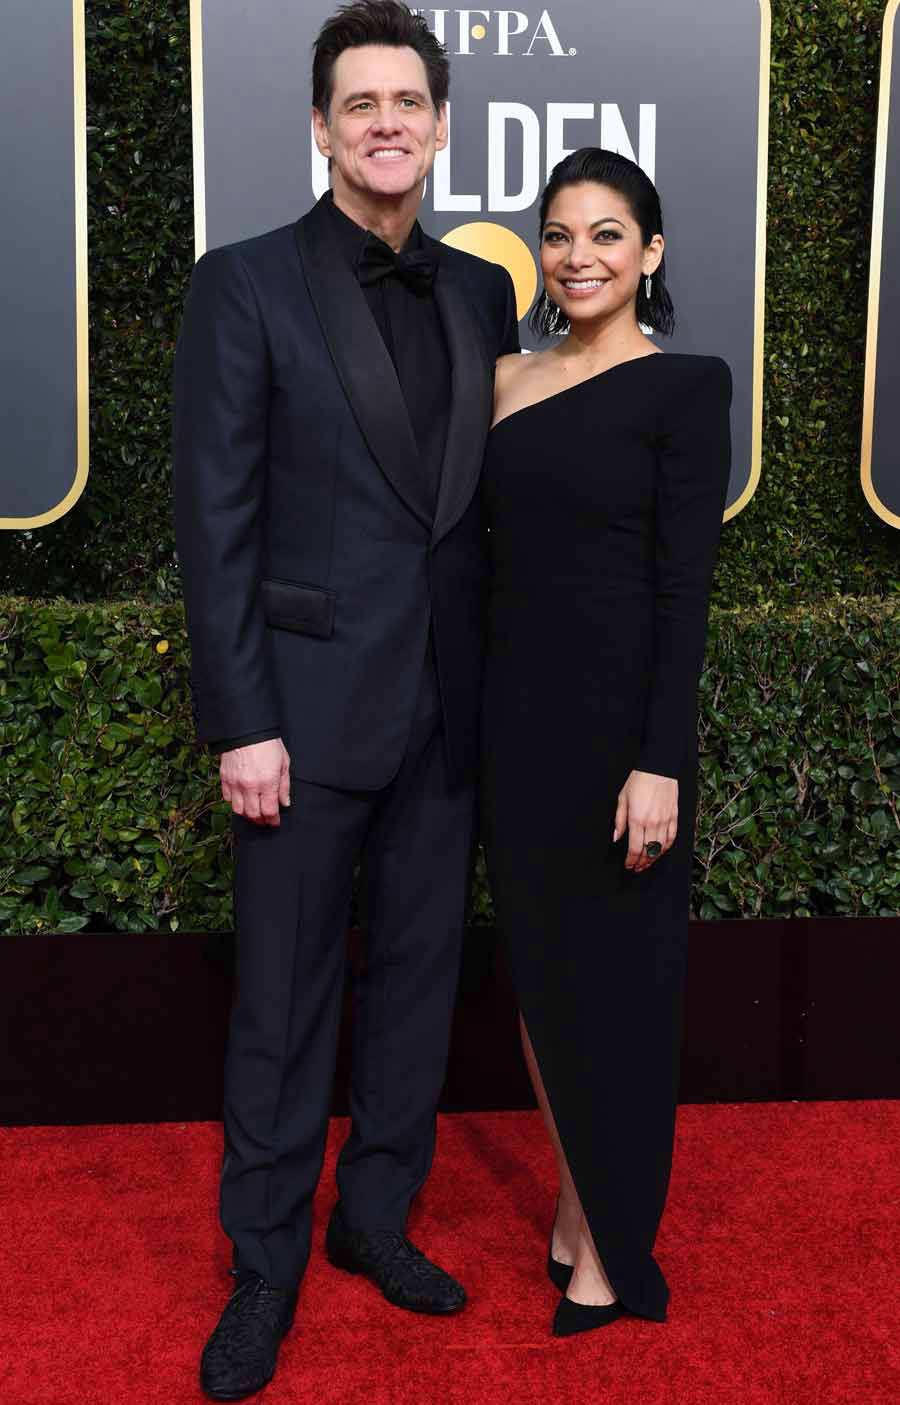 76th Annual Golden Globes awards - ARRIVALSGolden Globe 2018